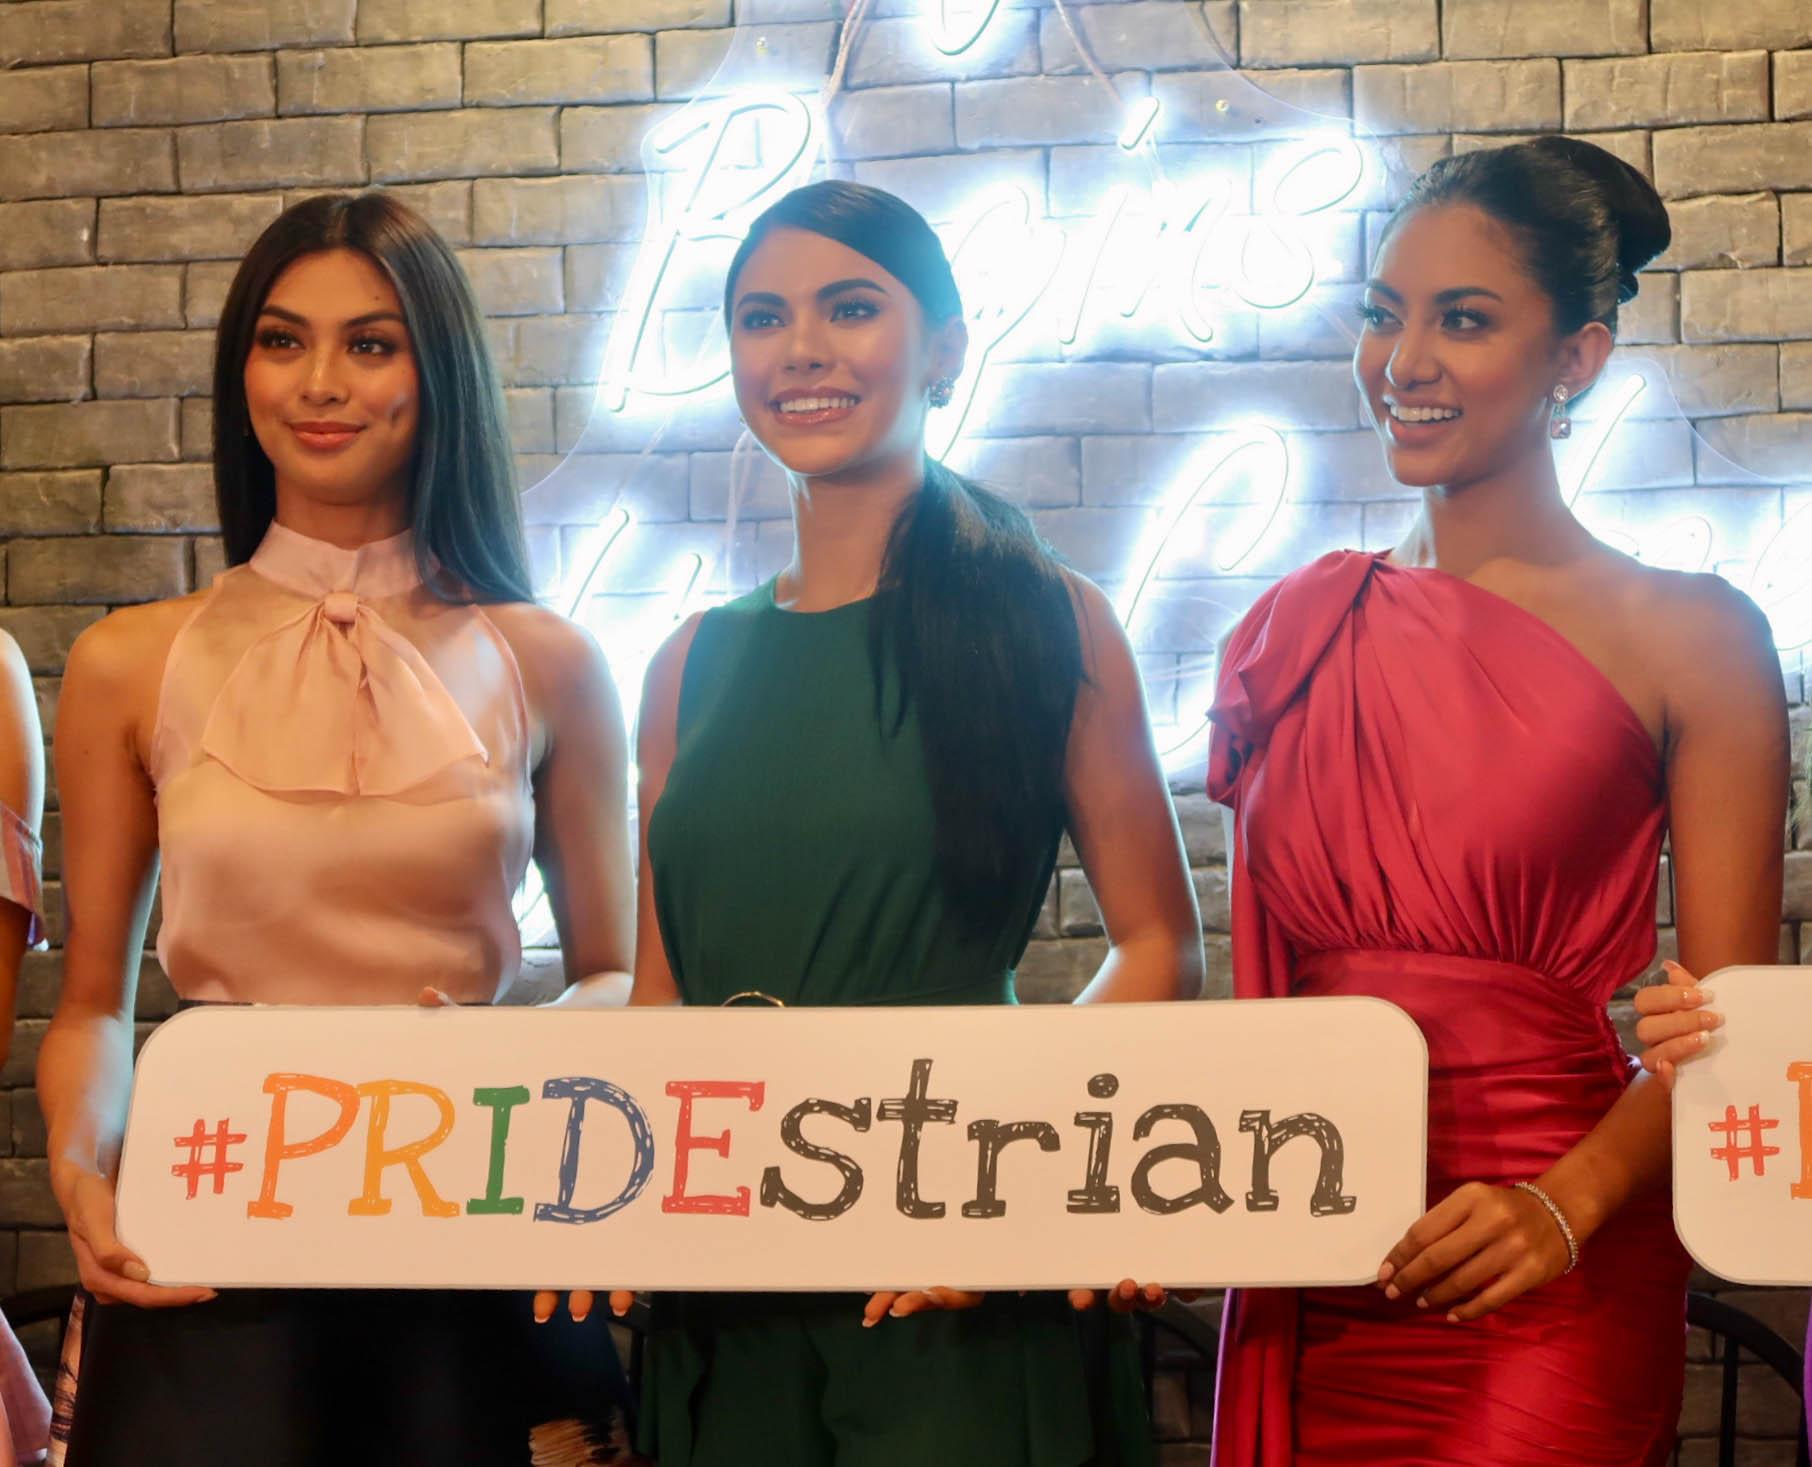 PRIDESTRIAN. Bb. Pilipinas International 2019 Patch Magtanong, Miss Universe Philippines 2019 Gazini Ganados, and Bb Pilipinas Supranational 2019 Resham Saeed hold the 'Pridestrian' sign.